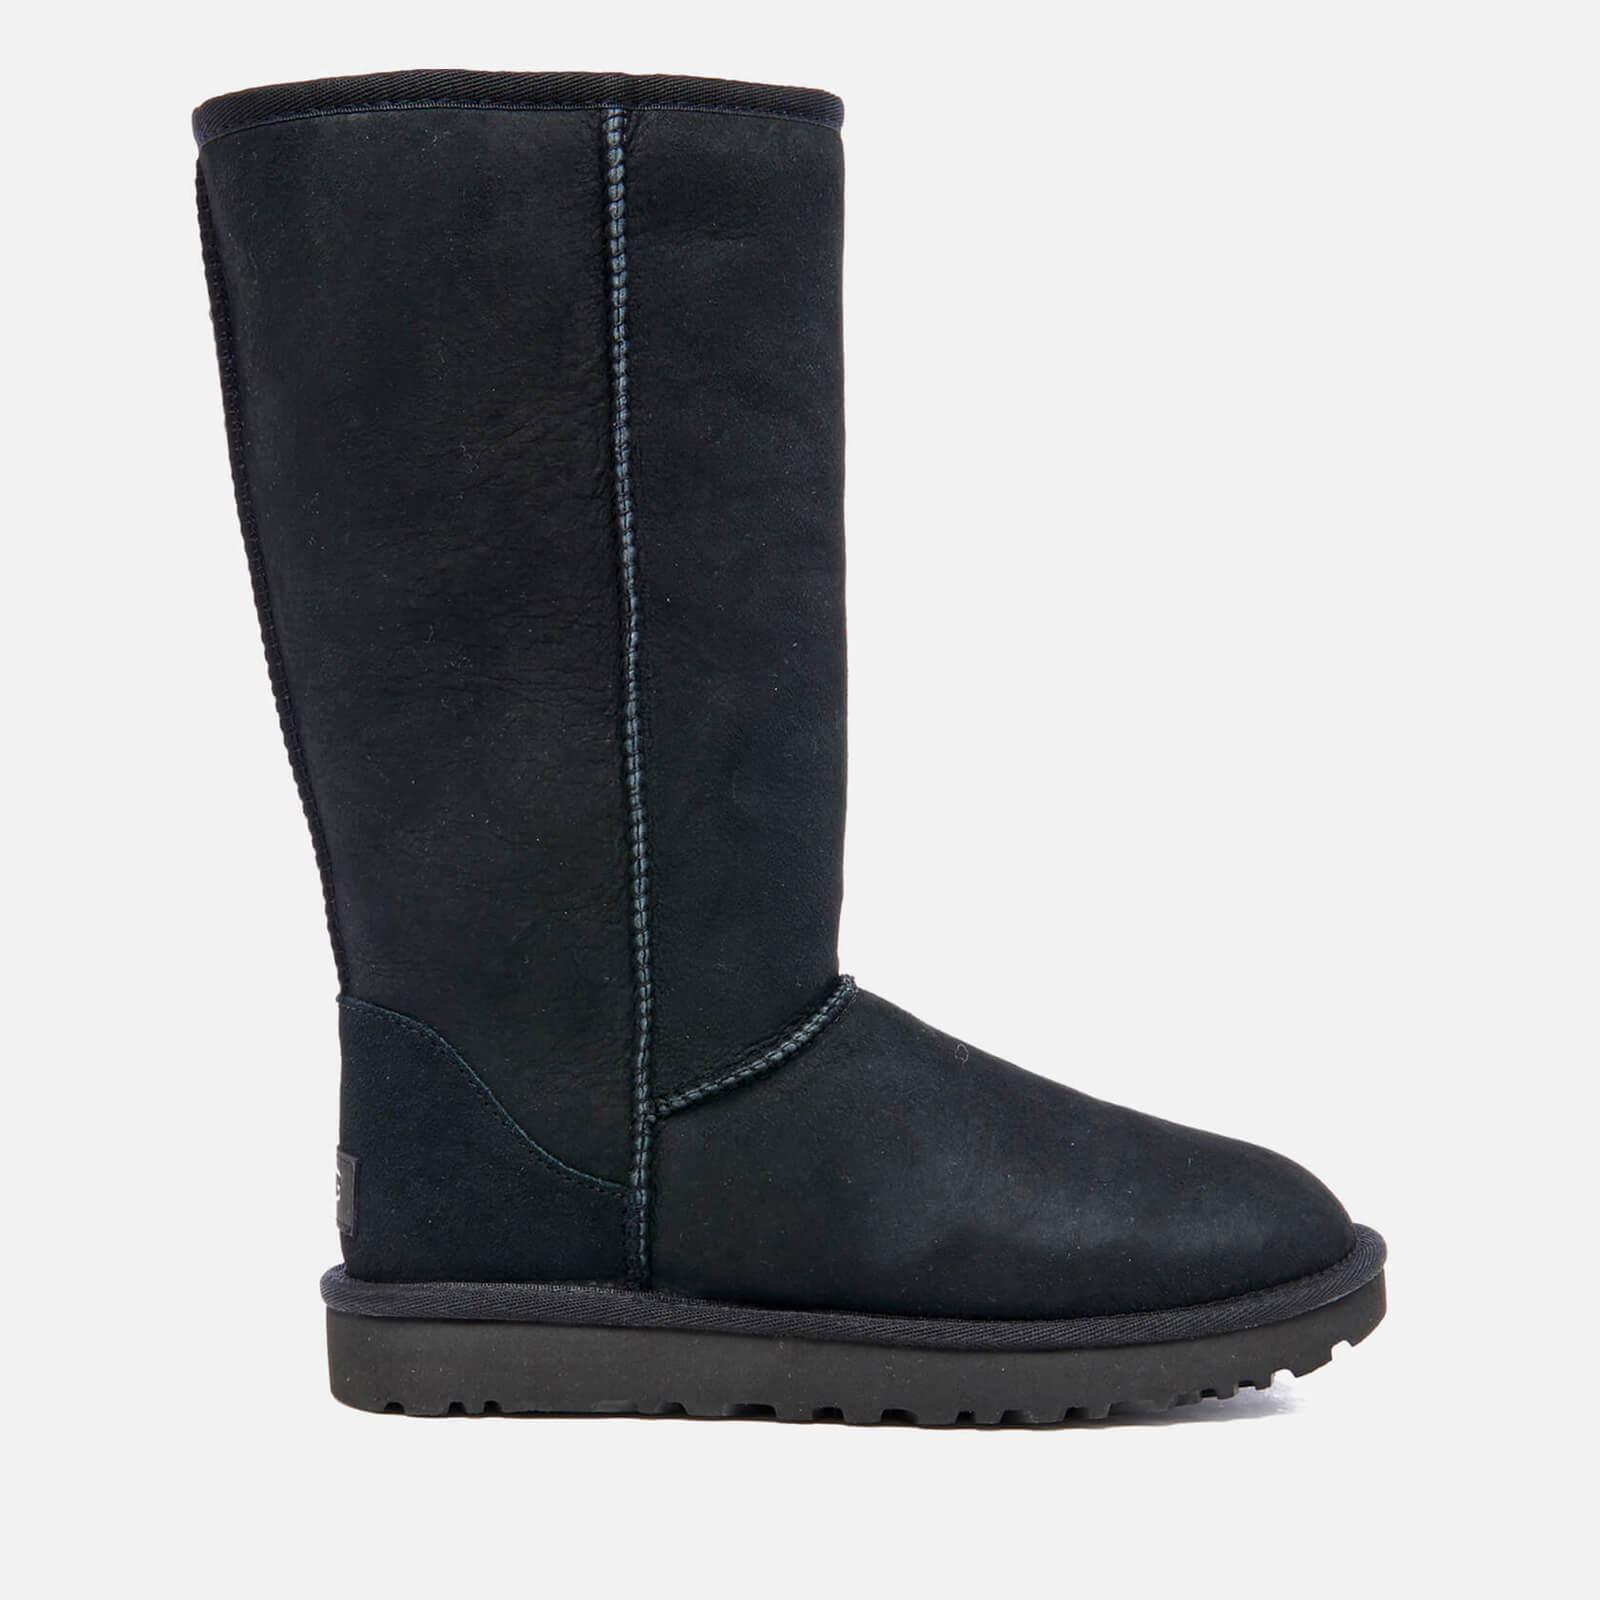 8c7828d35fe UGG Women's Classic Tall II Sheepskin Boots - Black